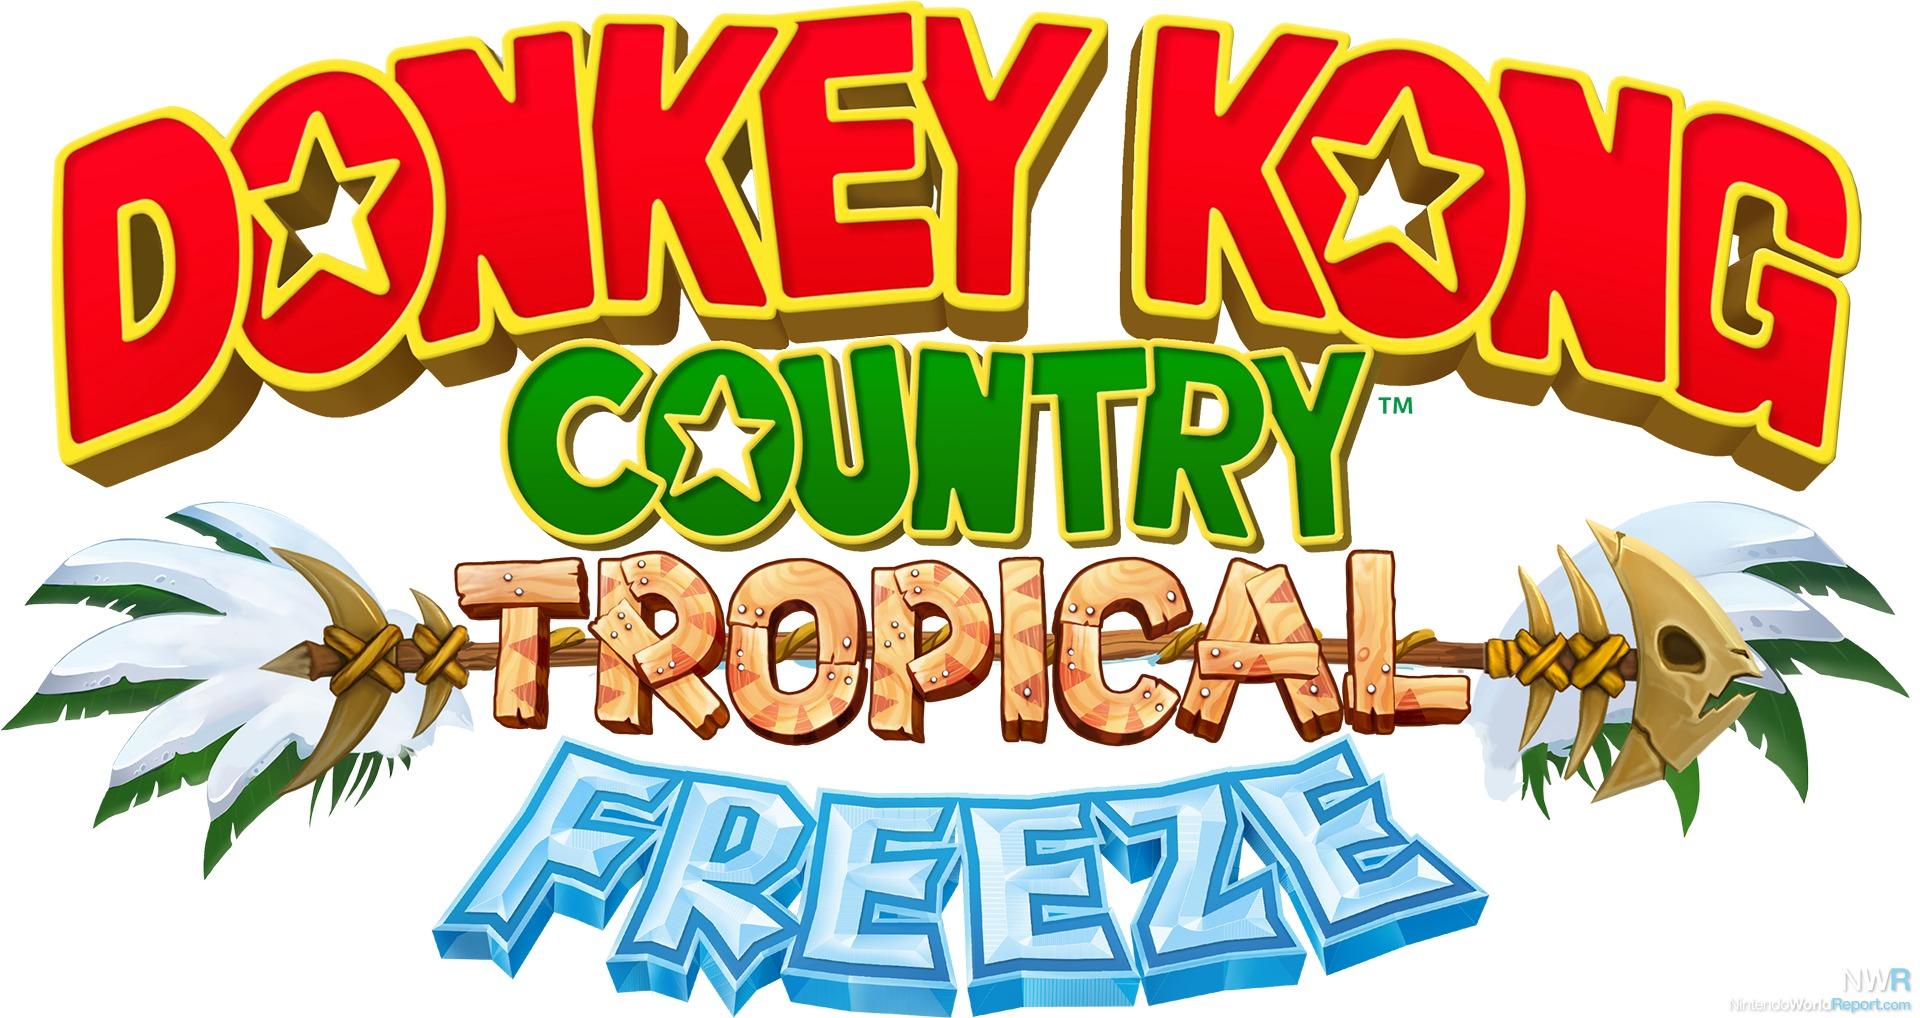 Donkey_Kong_Country_Tropical_Freeze_logo.jpg